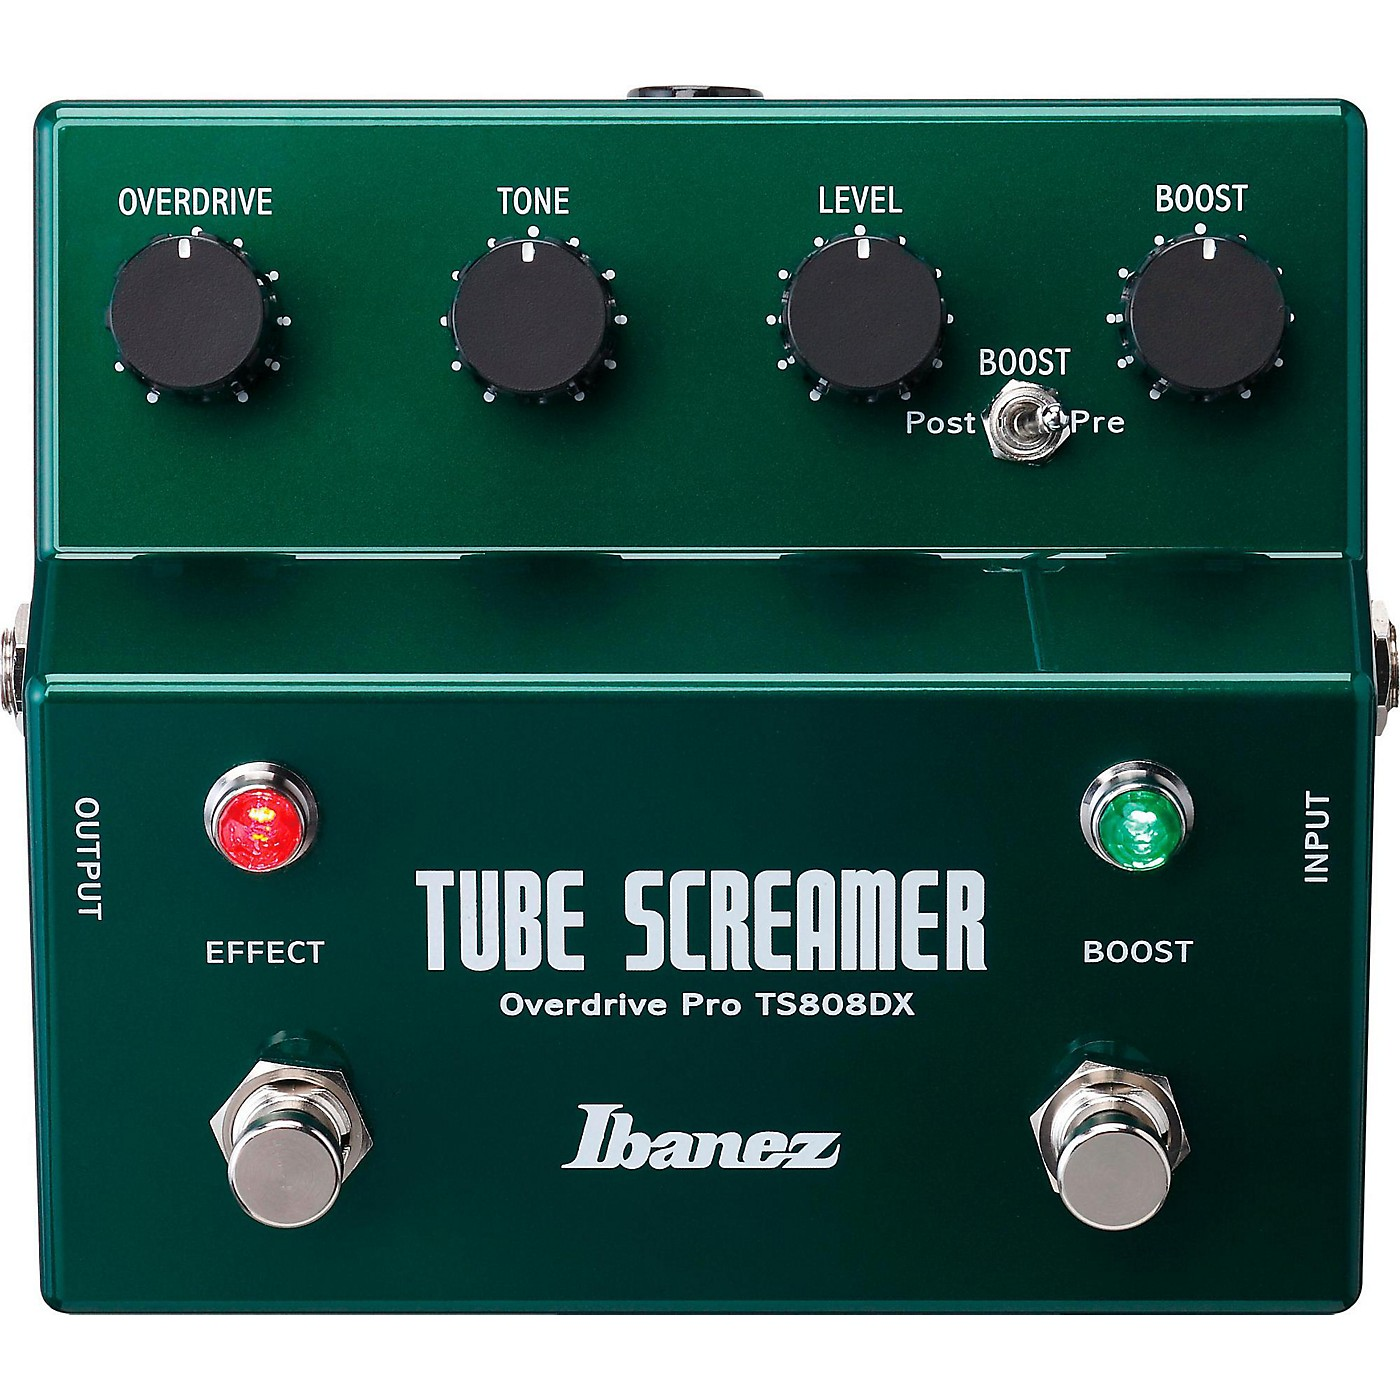 Ibanez Tube Screamer TS808DX Guitar Effects Pedal thumbnail